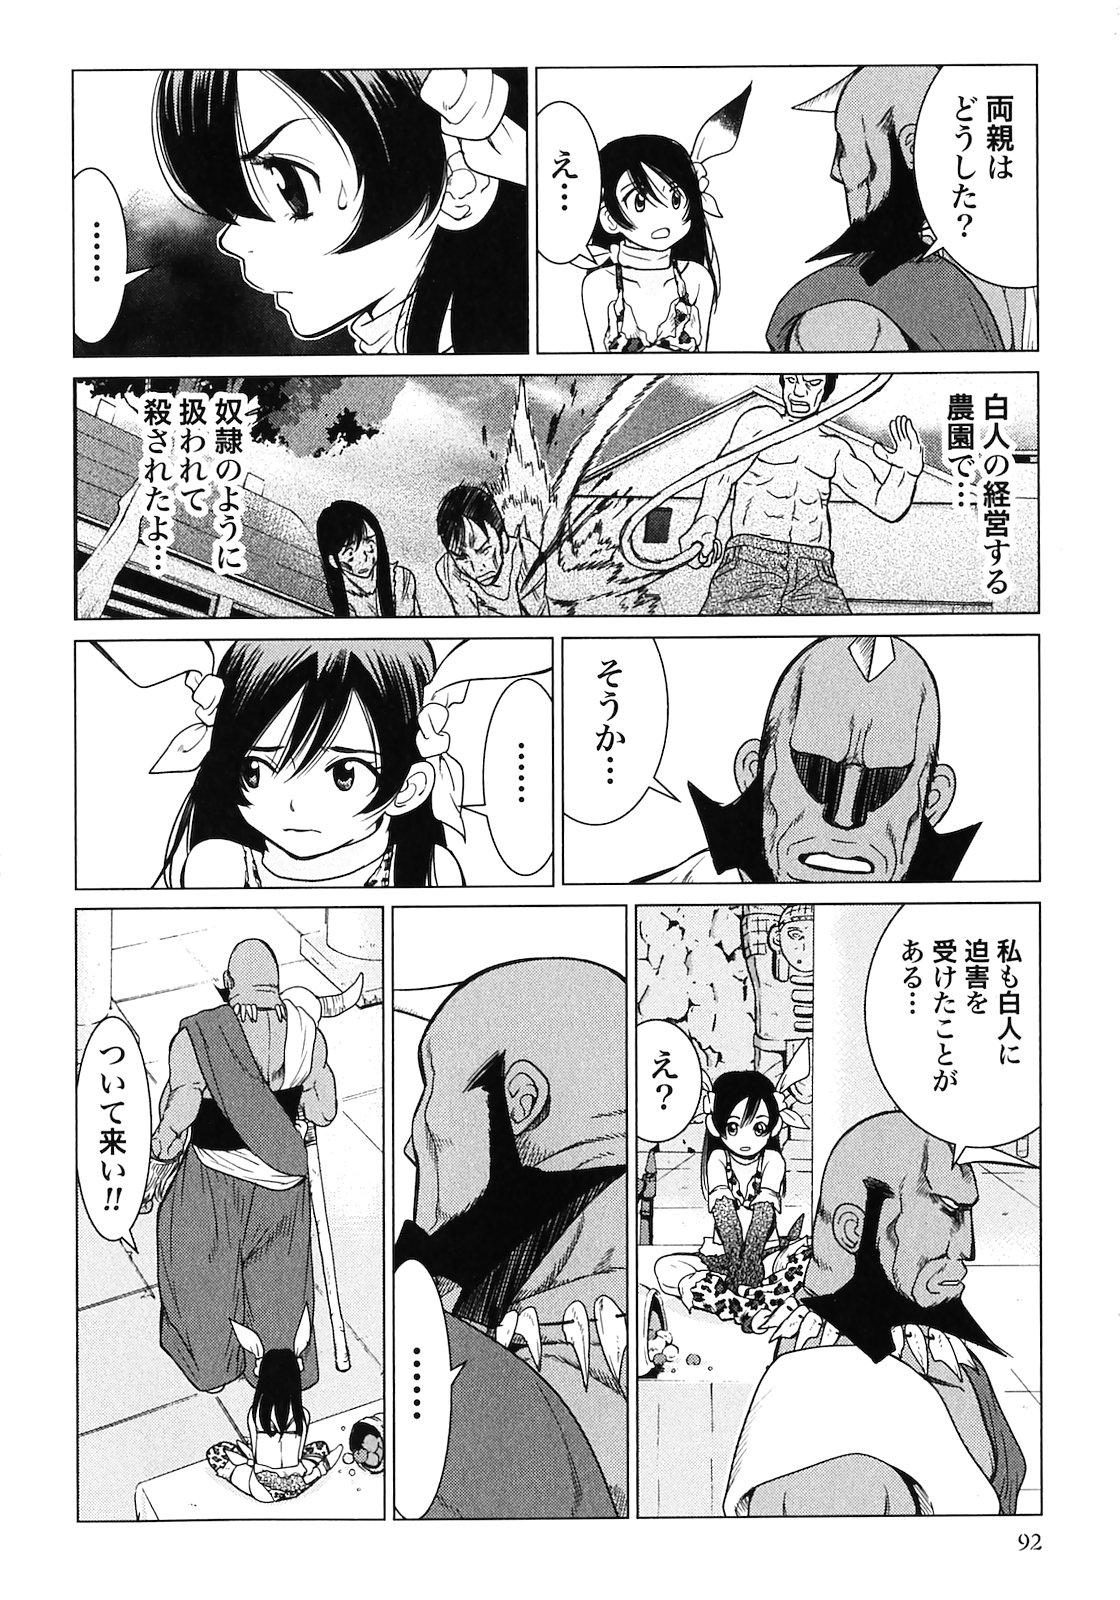 Makyo no Shanana Vol.02 93